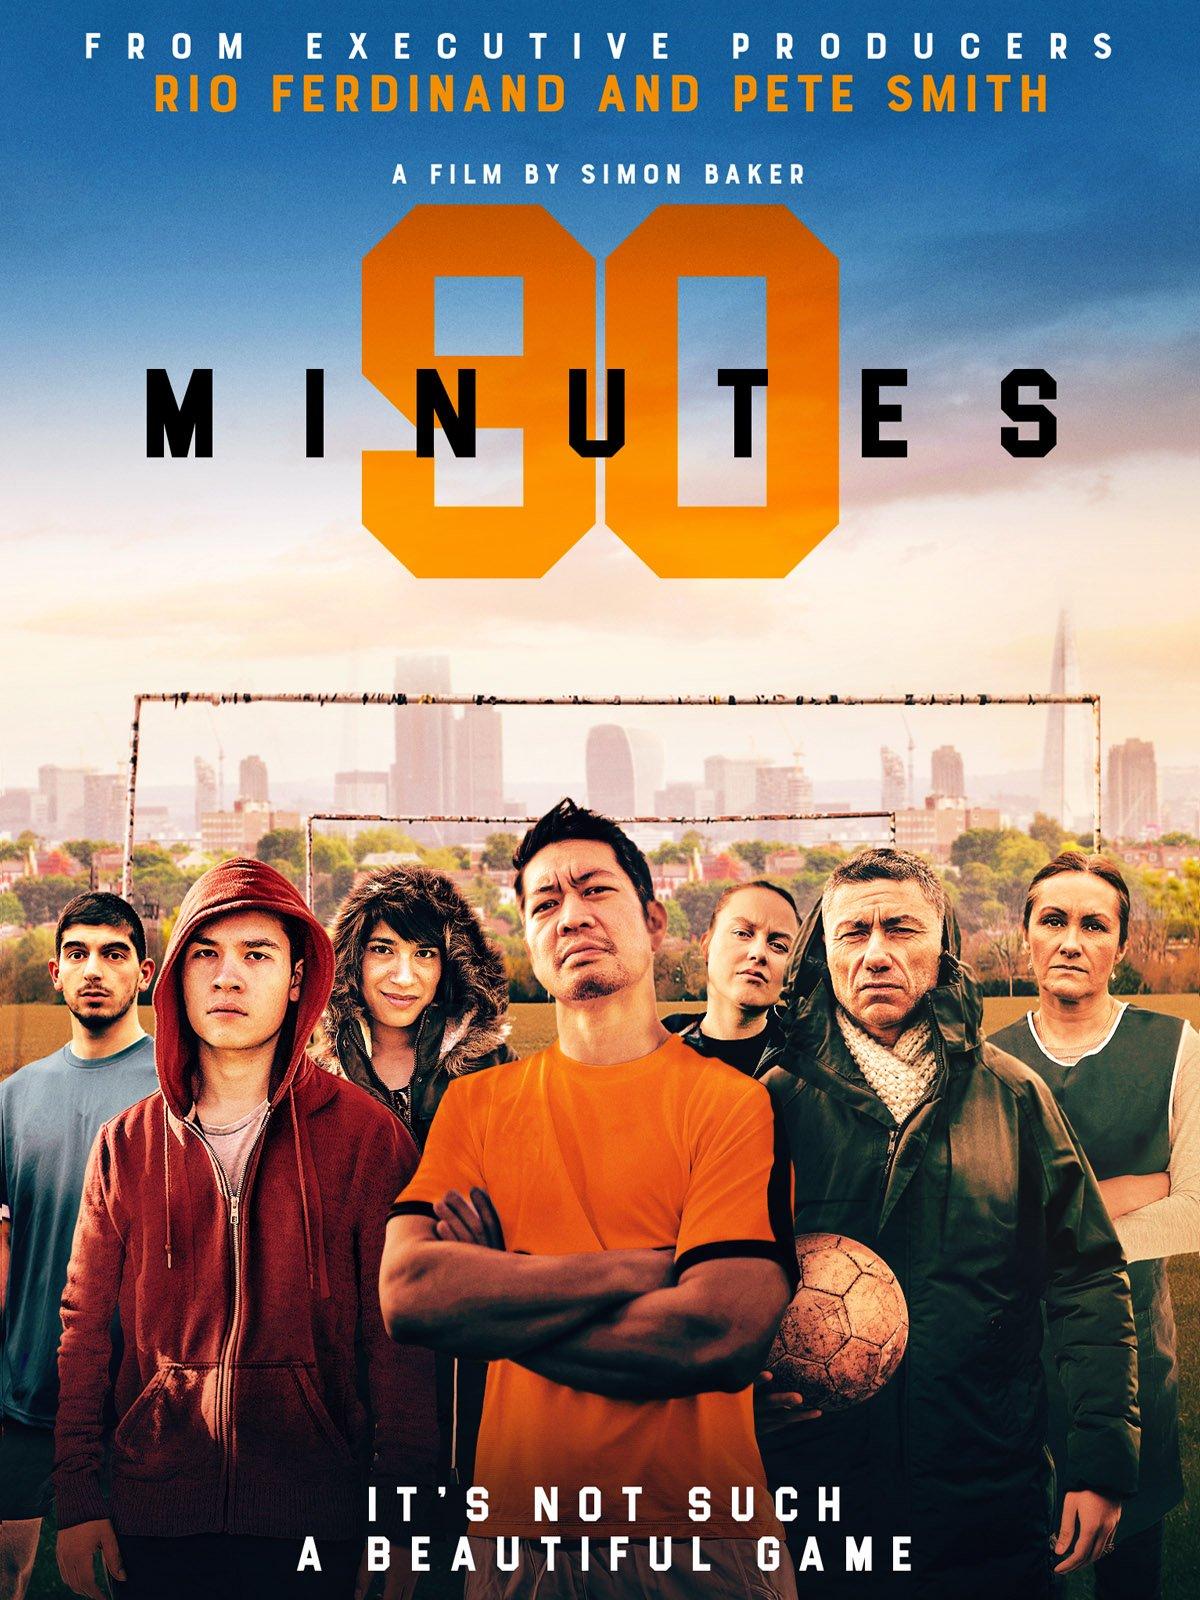 90 Minutes – Digital Artwork Portait